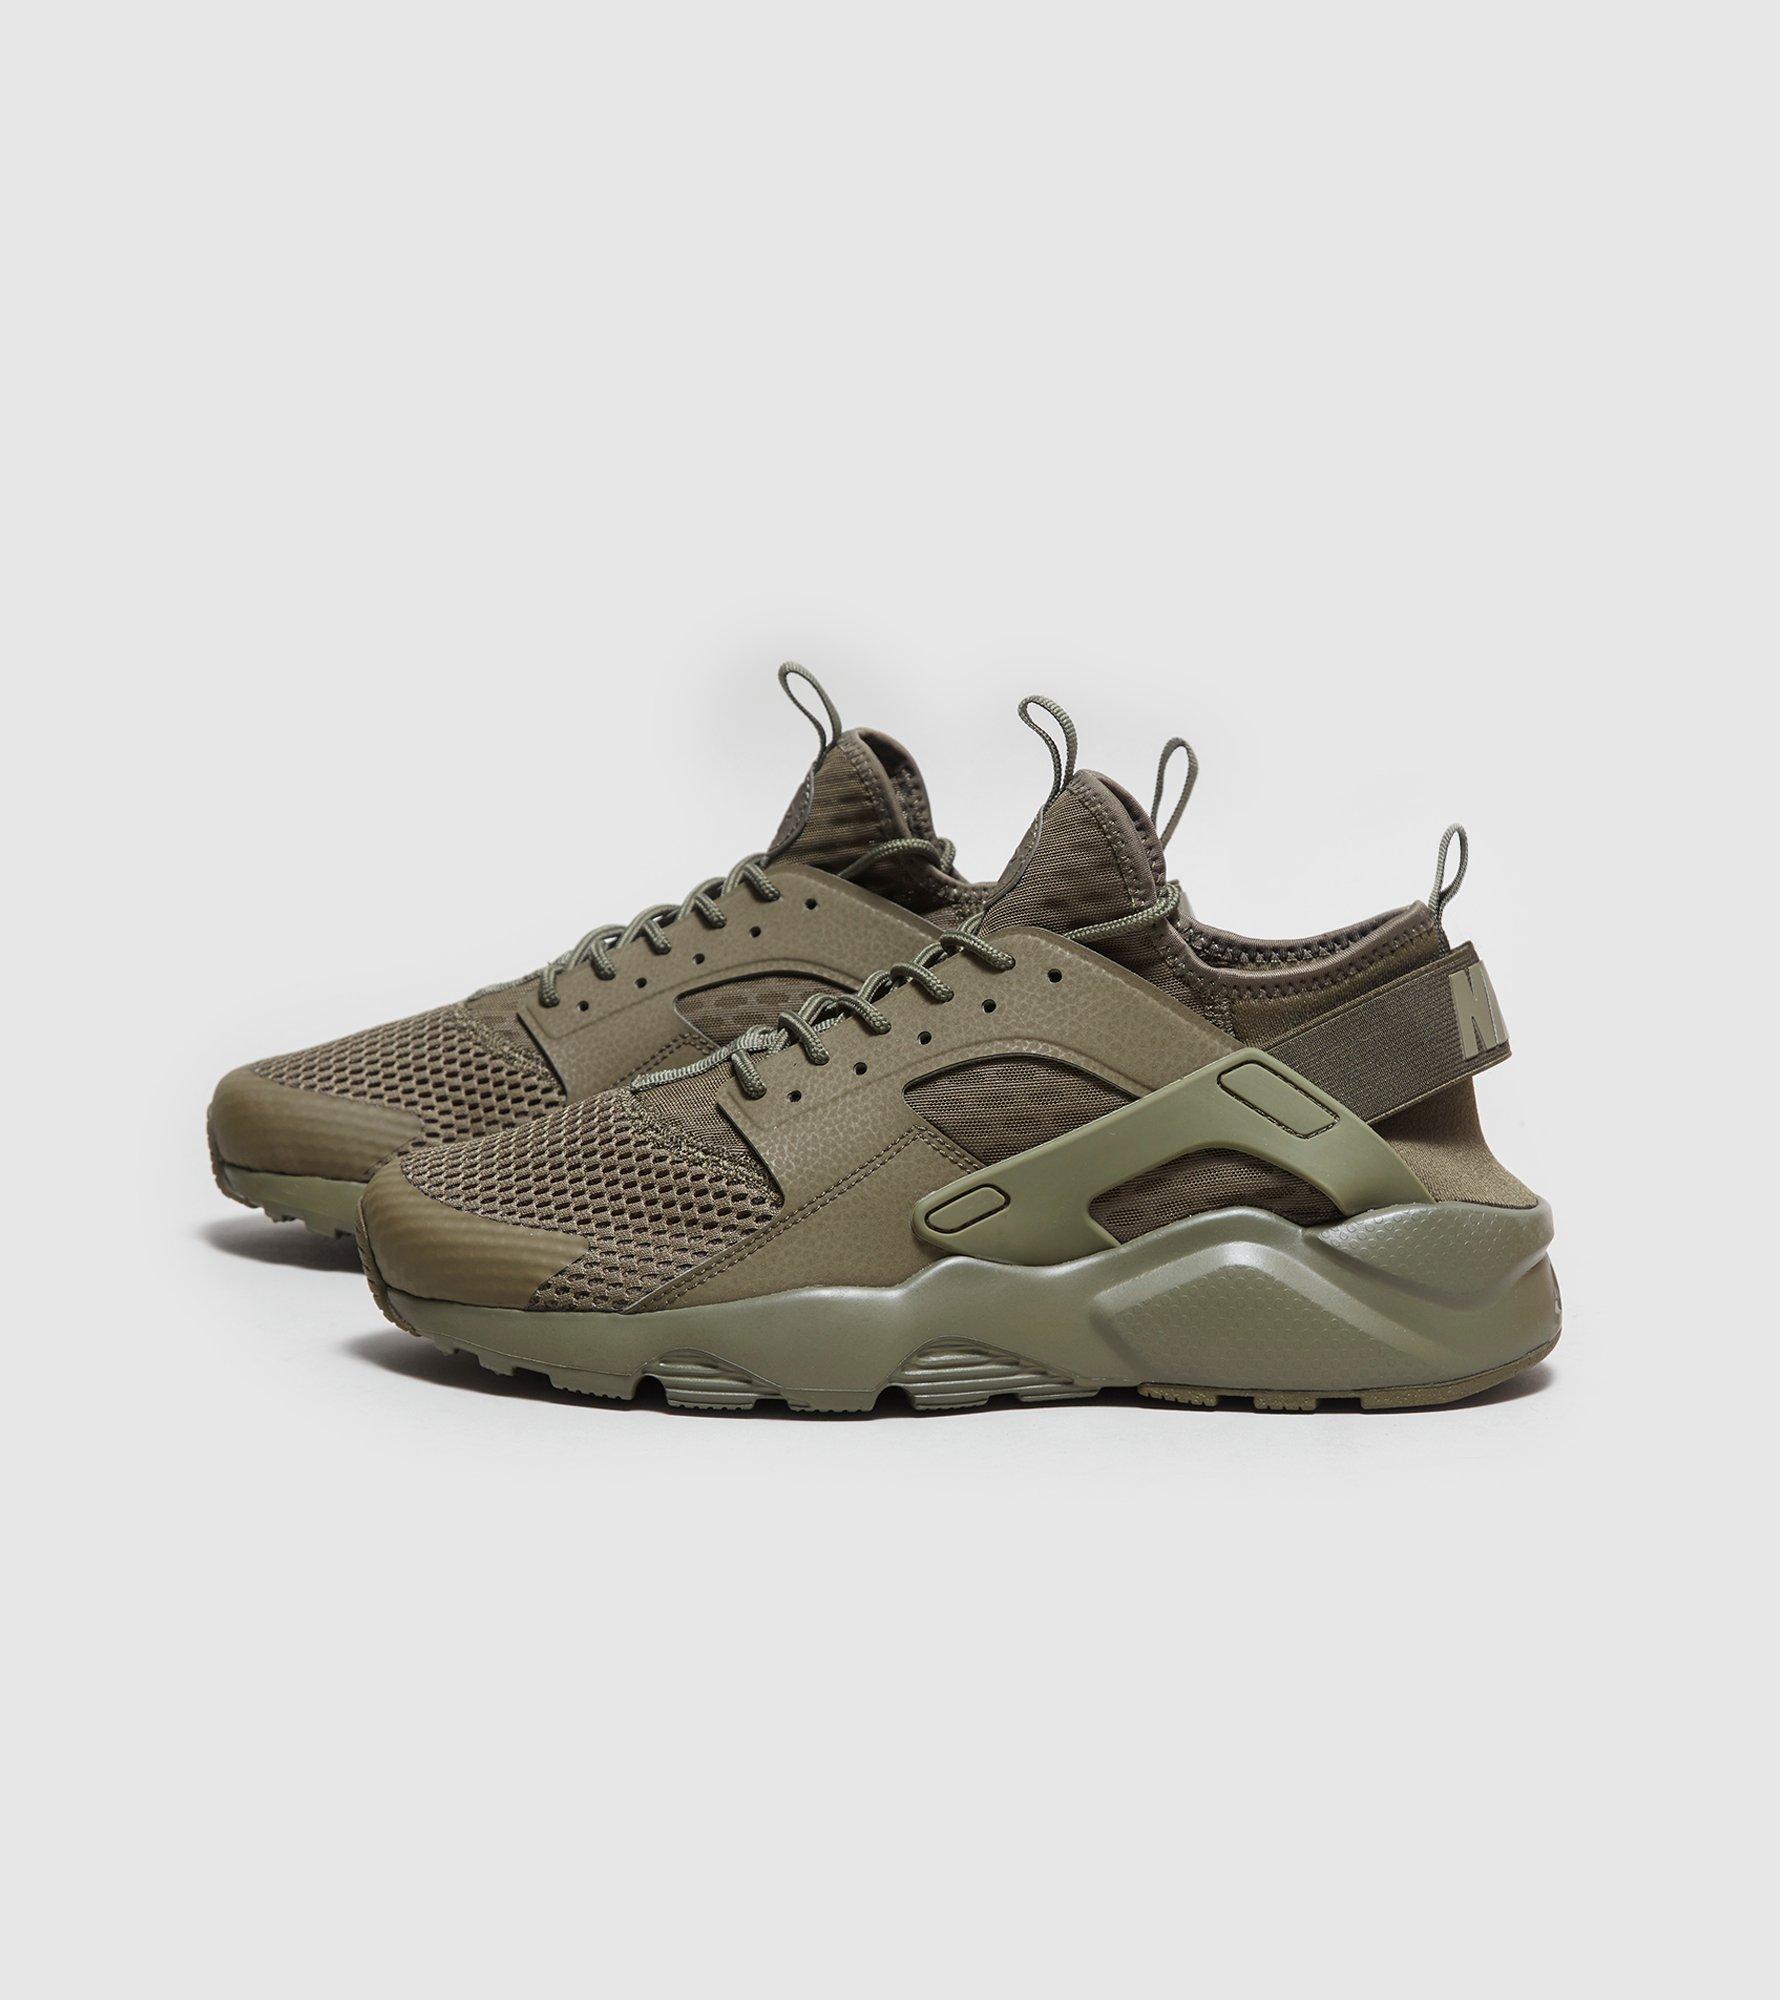 Nike Huarache Size 2